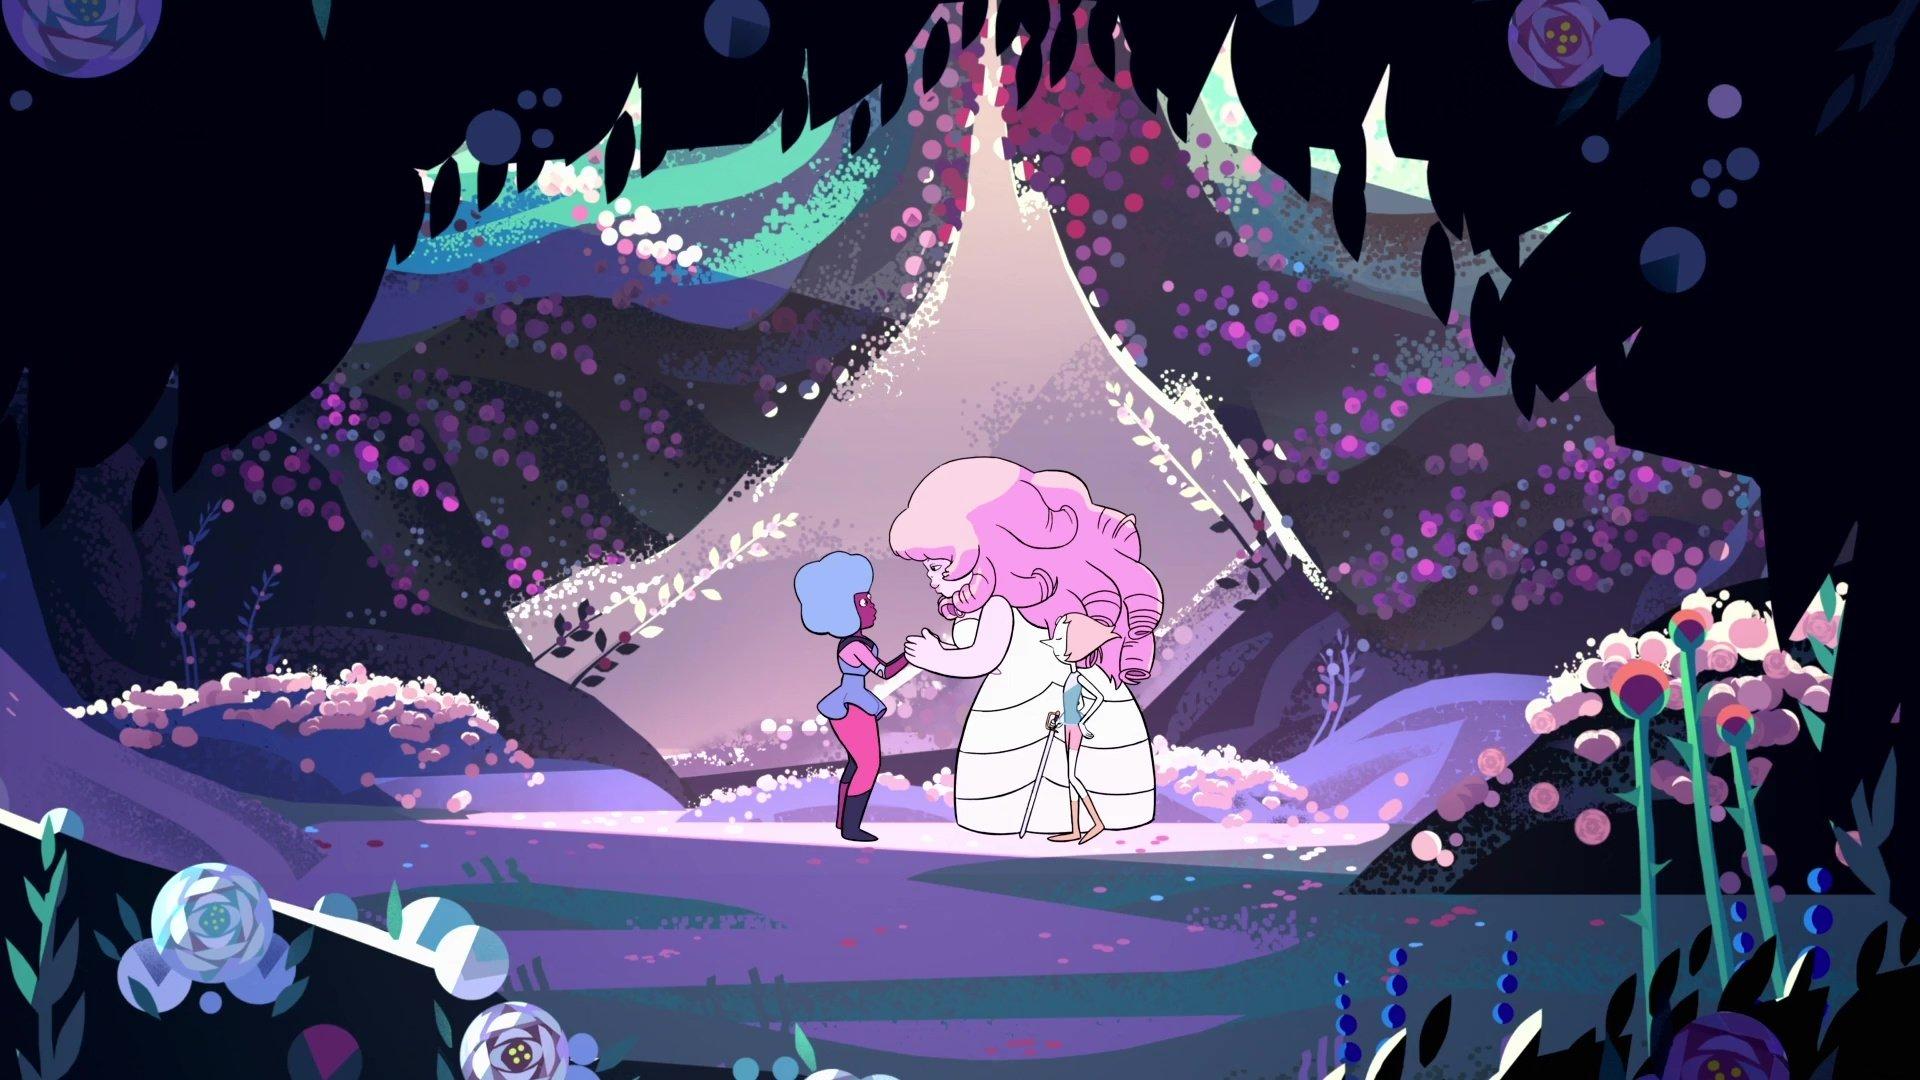 Steven Universe Wallpaper Desktop